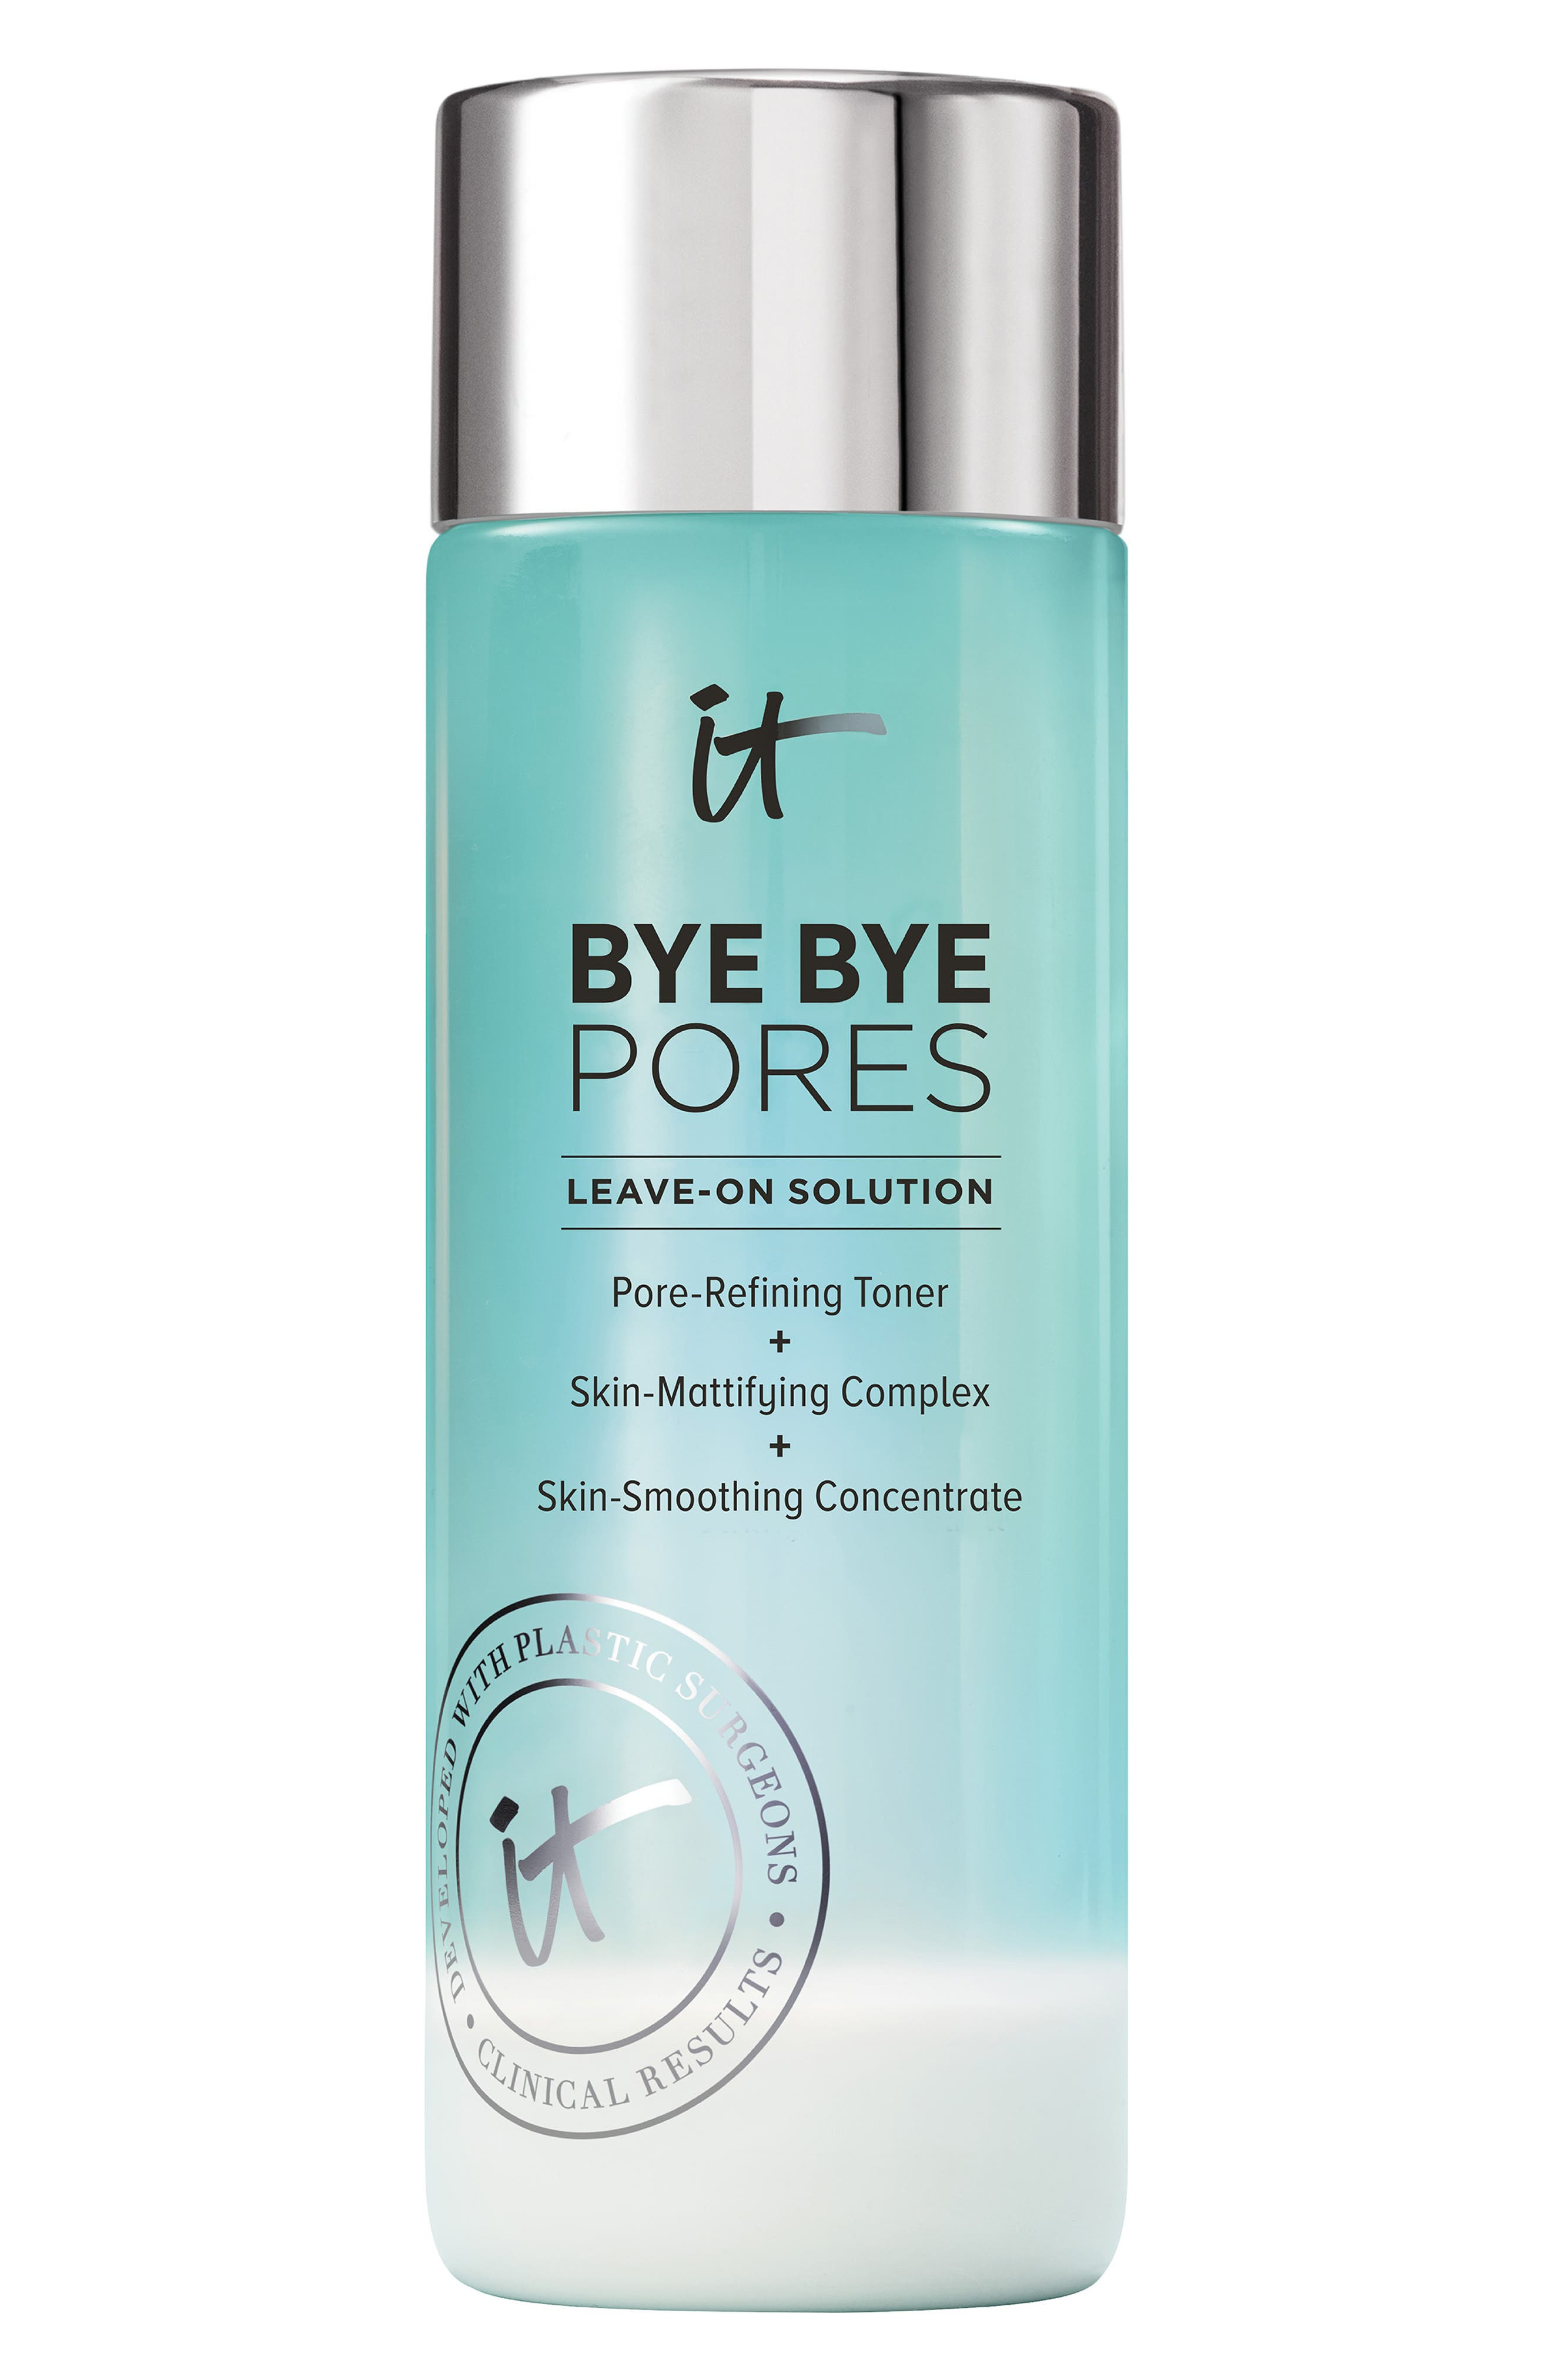 Bye Bye Pores Leave-On Solution Pore-Refining Face Toner